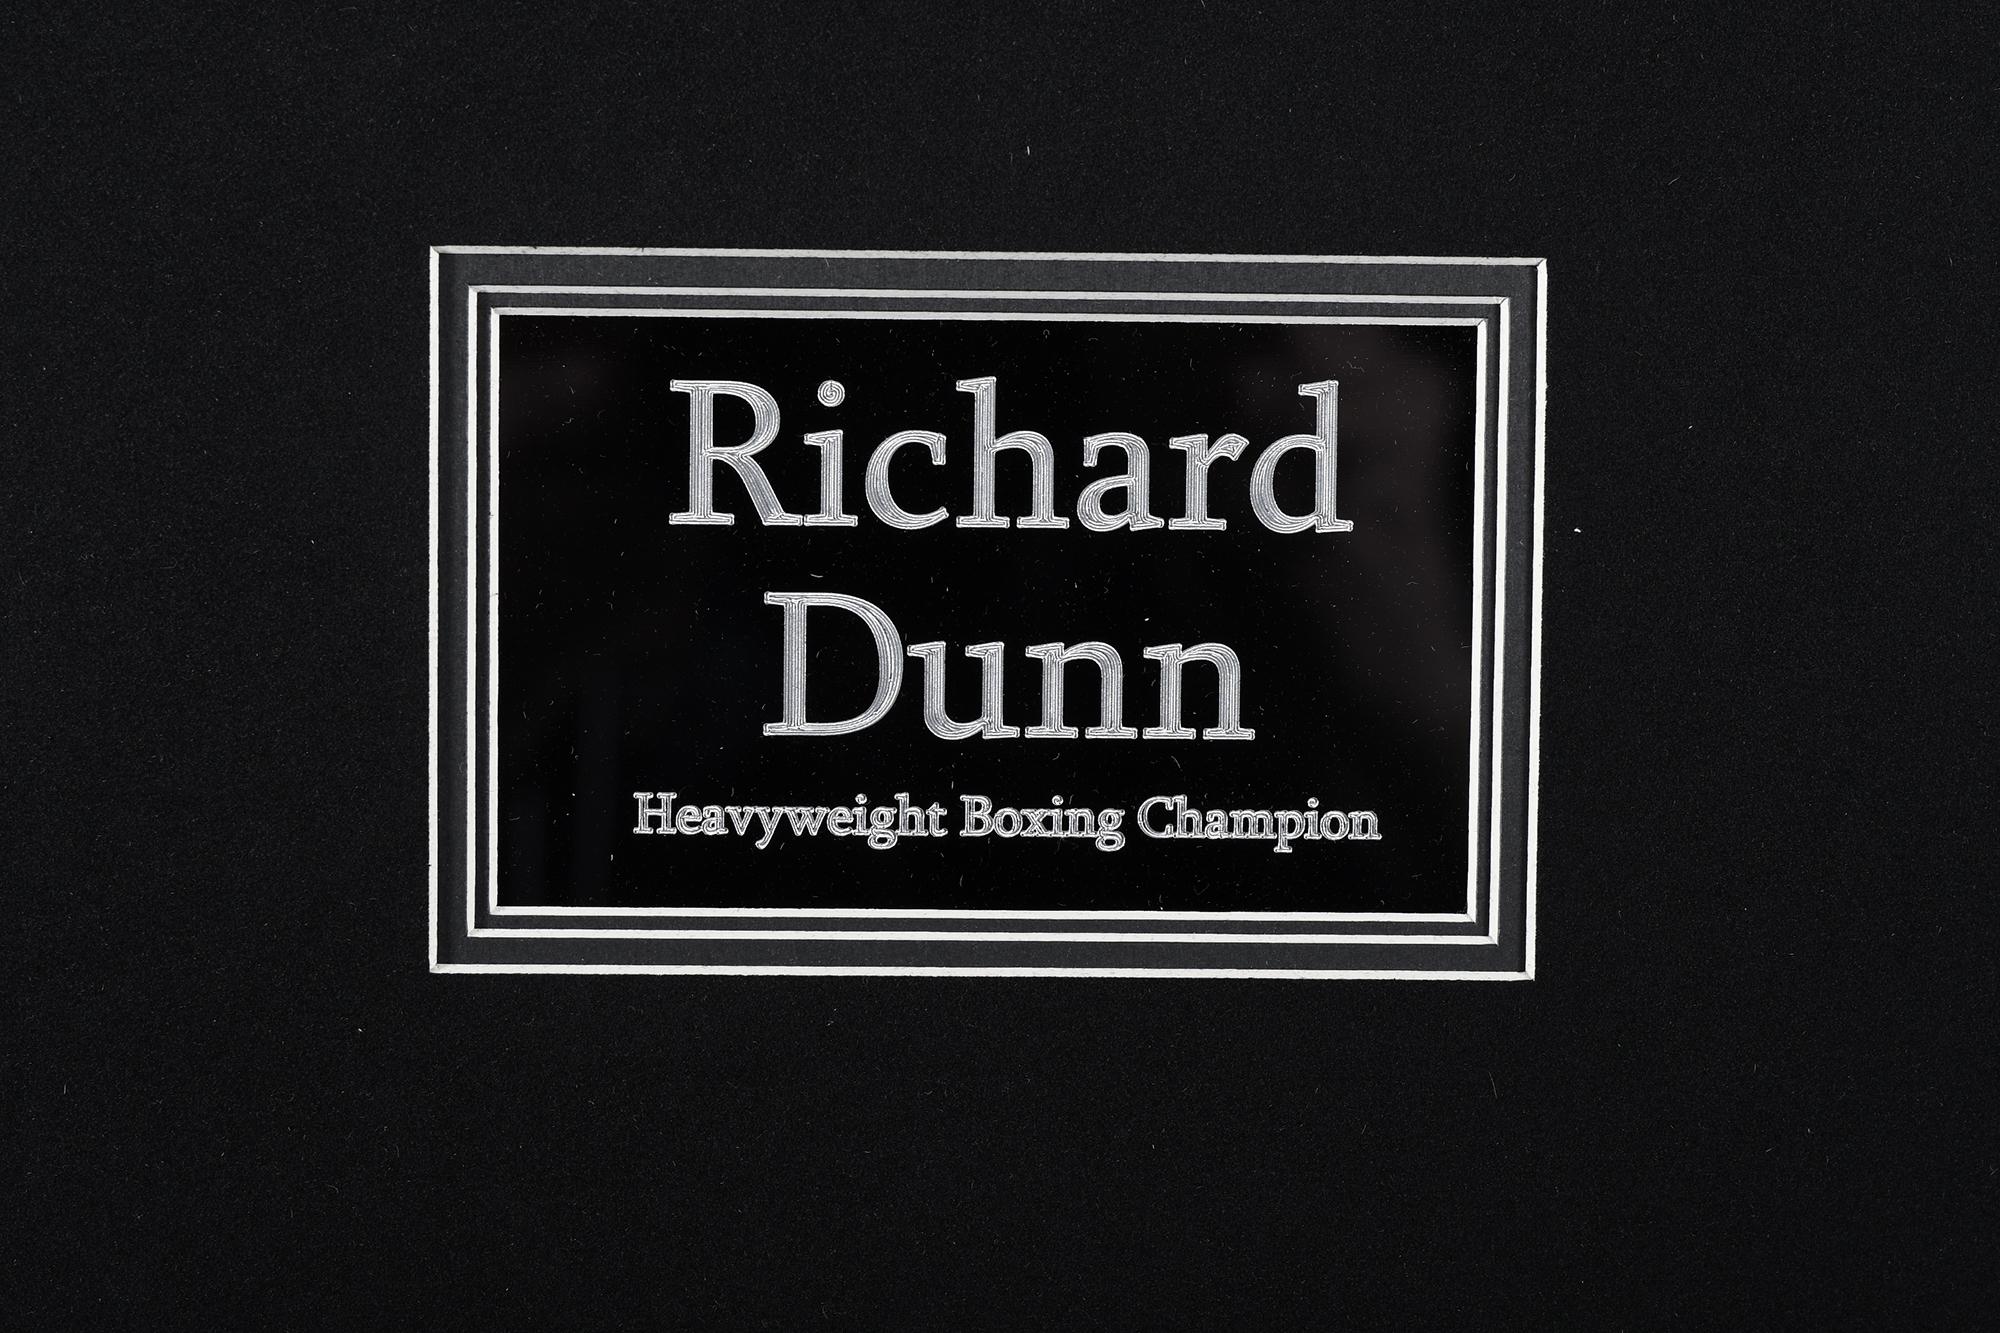 RICHARD DUNN SIGNATURE PRESENTATION - Image 2 of 2